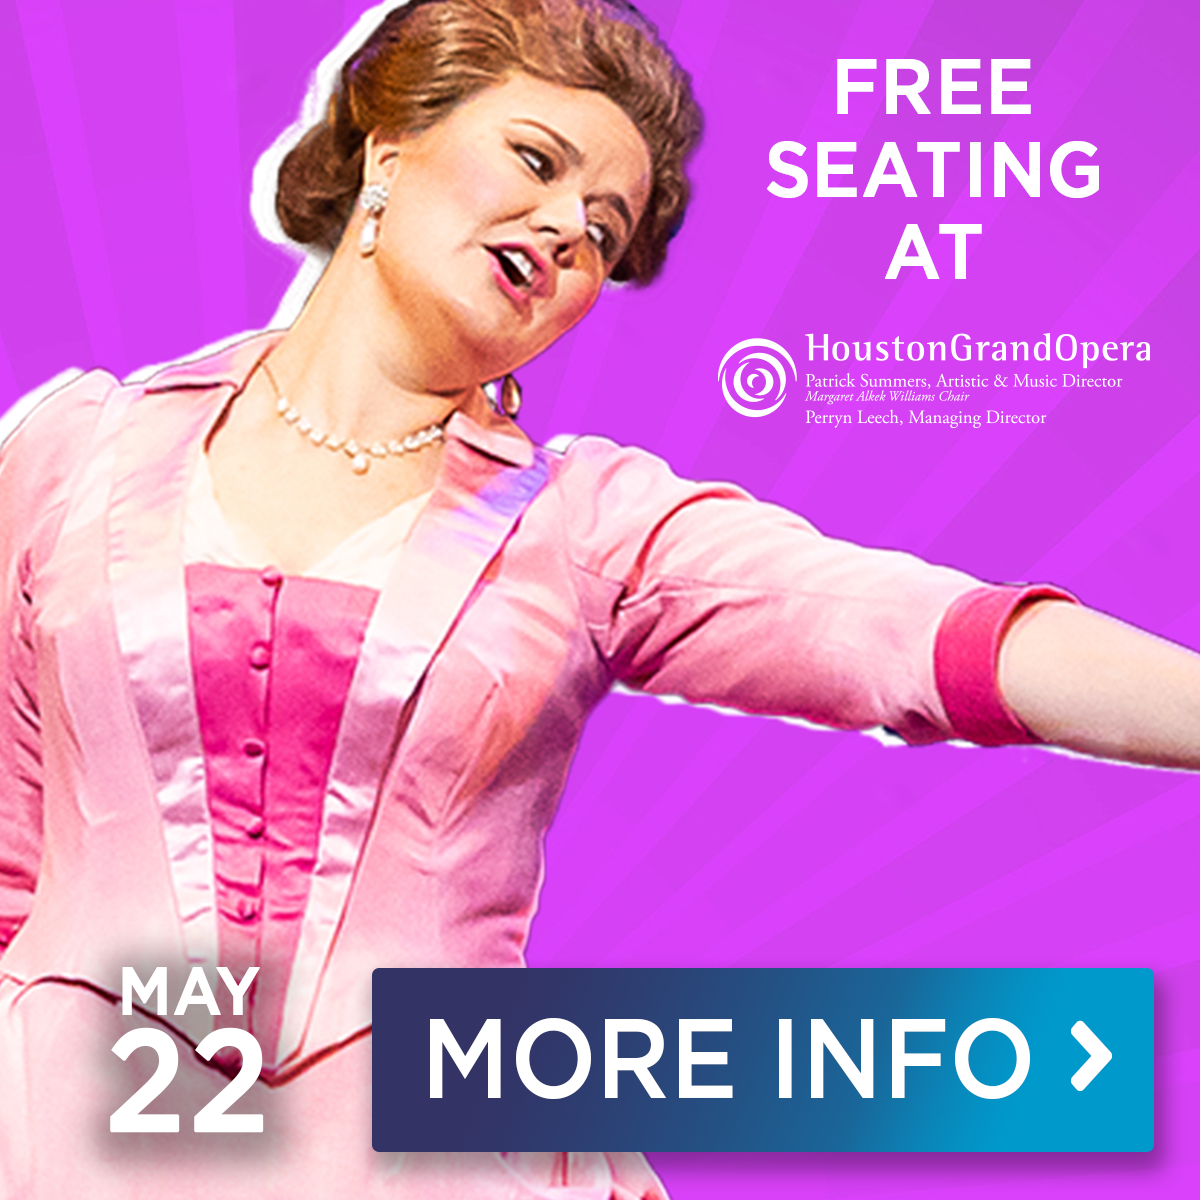 Houston Grand Opera at The Pavilion May 22